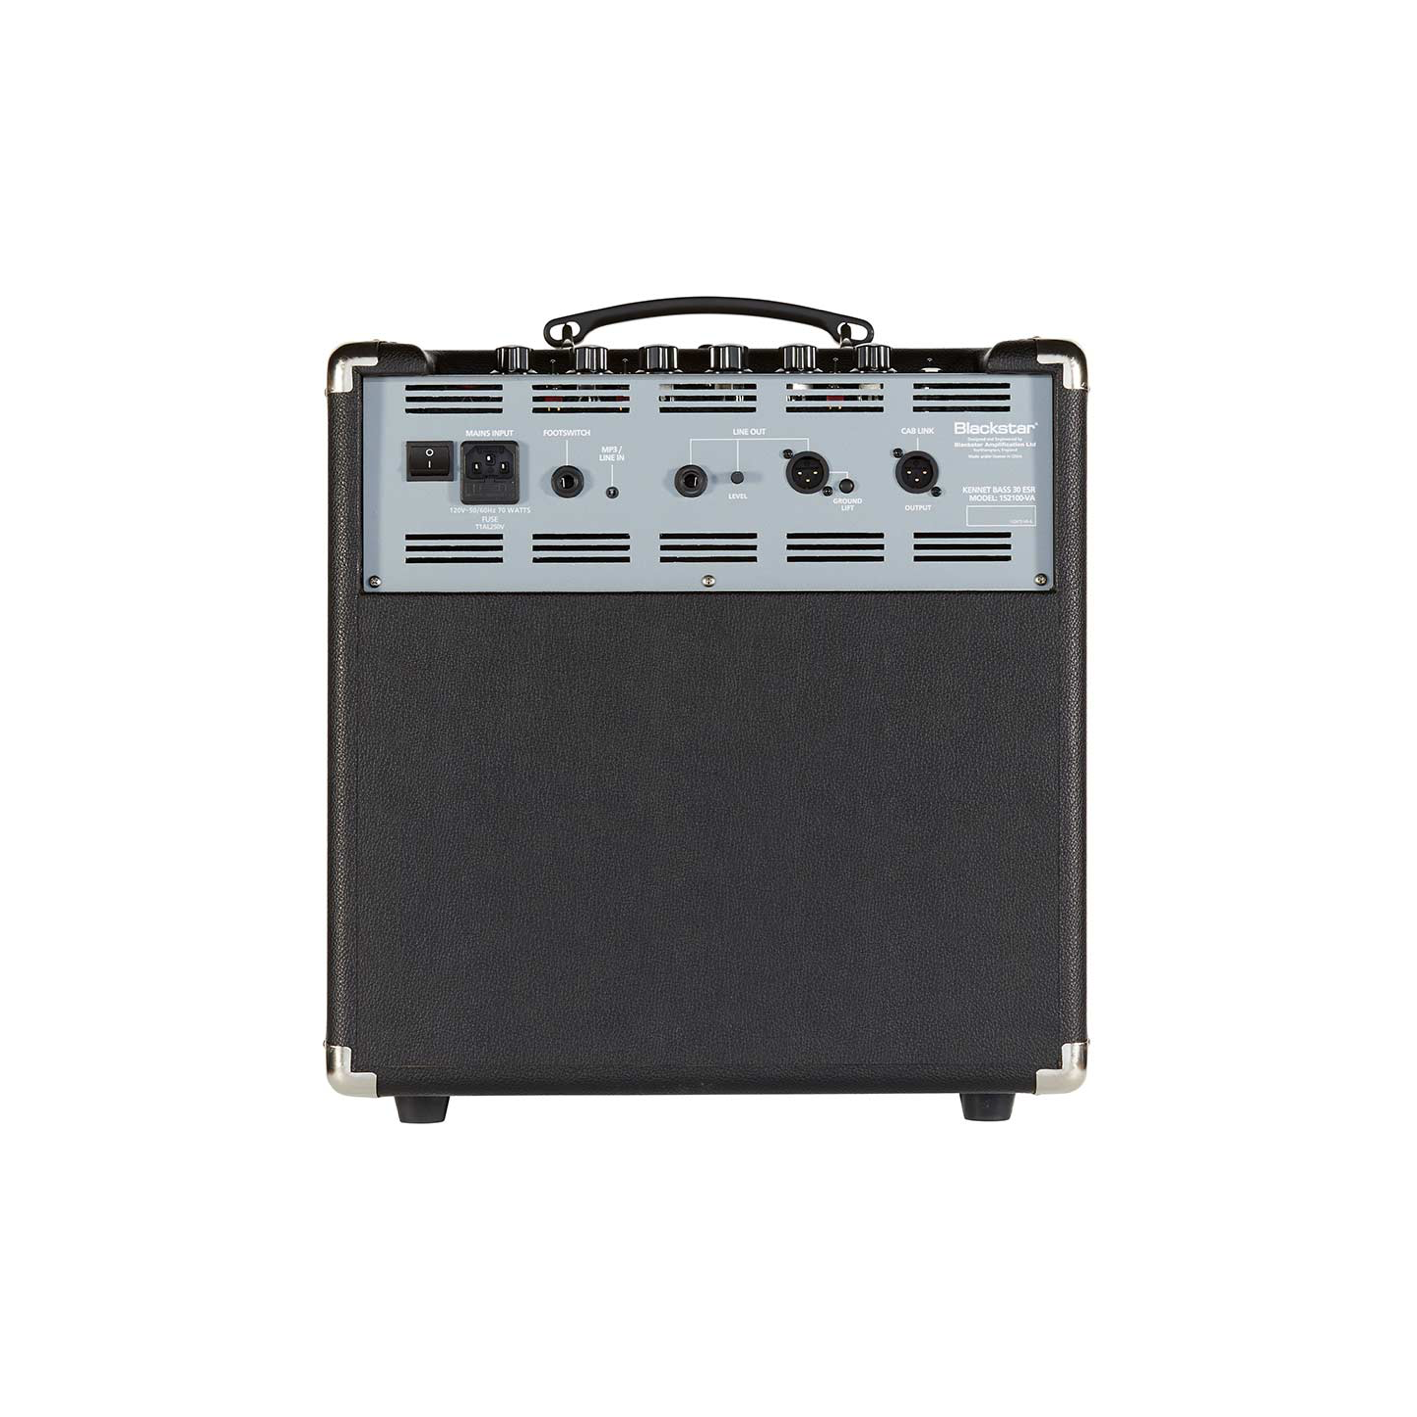 Blackstar Unity 30 Bass Amp